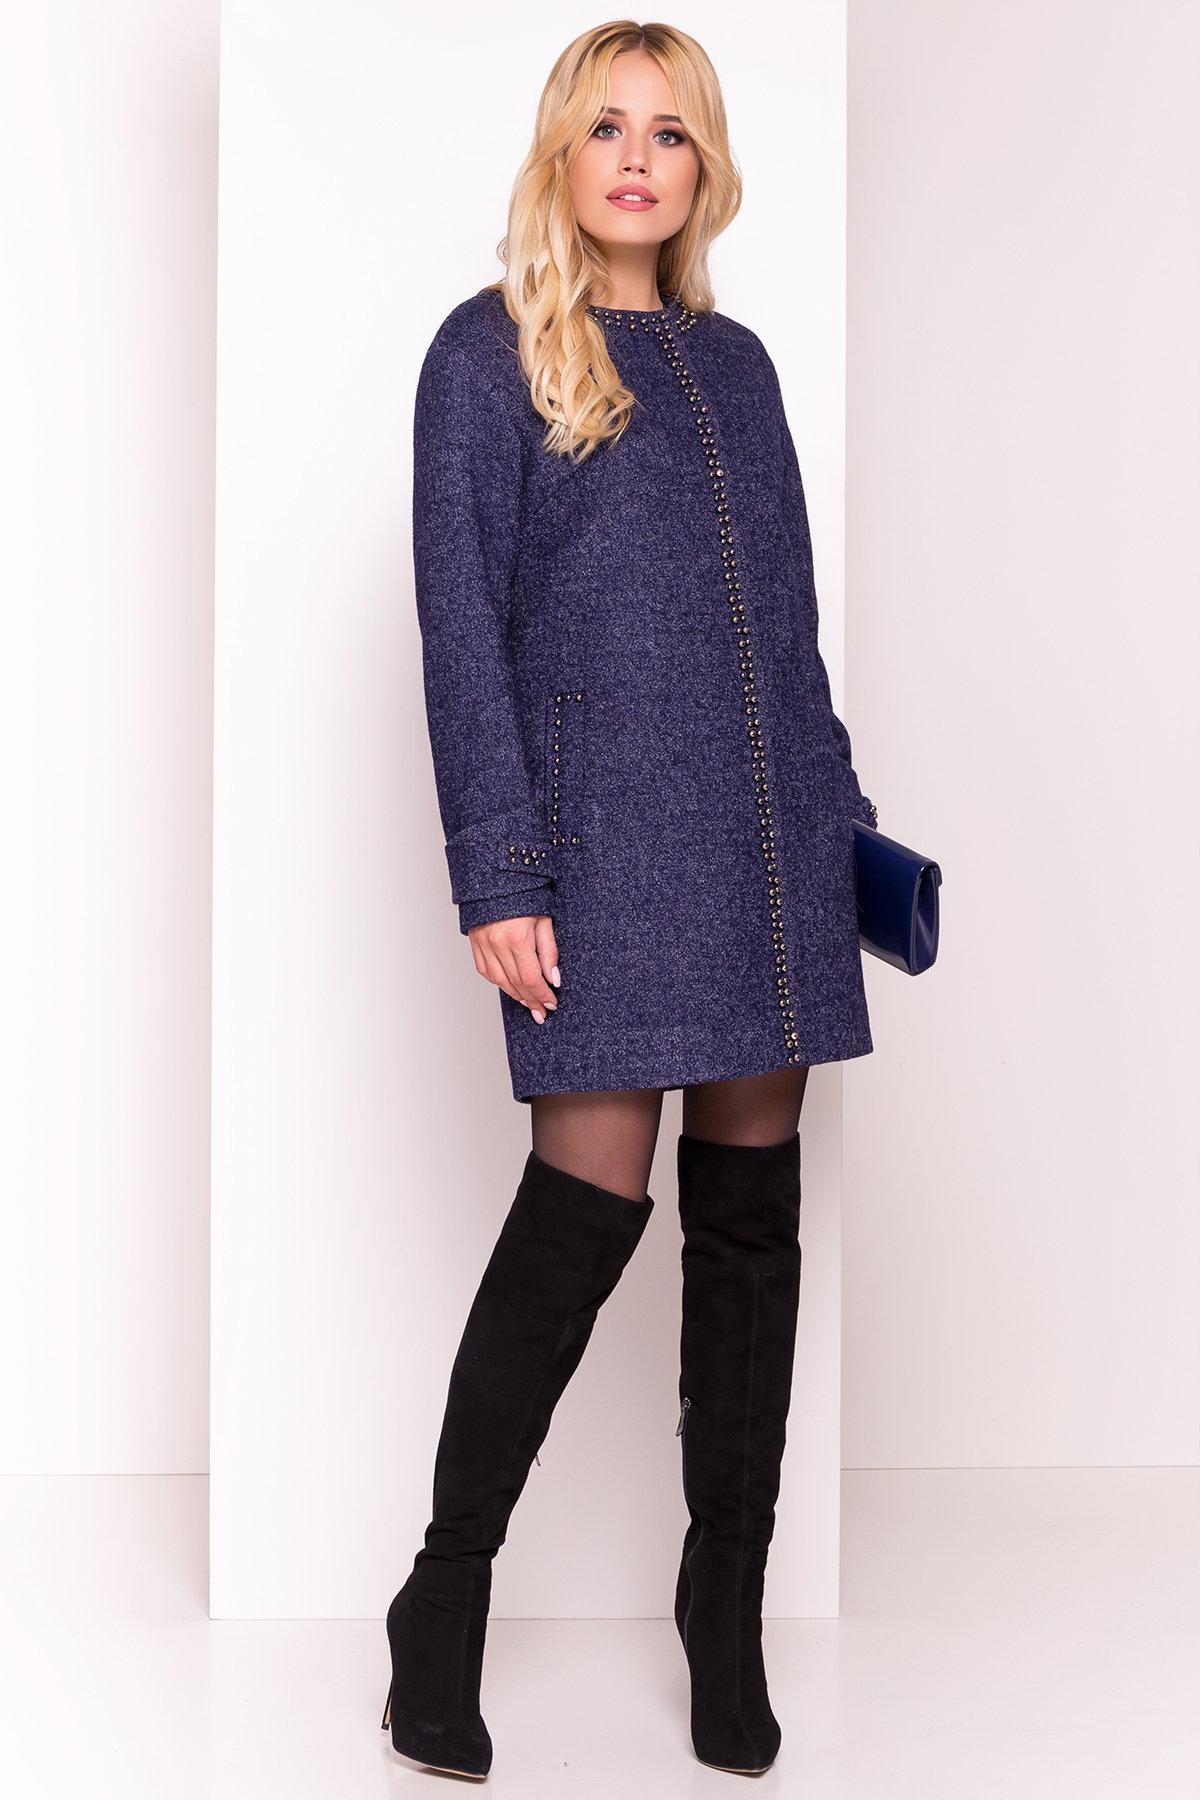 Пальто Анси 3429 Цвет: Темно-синий